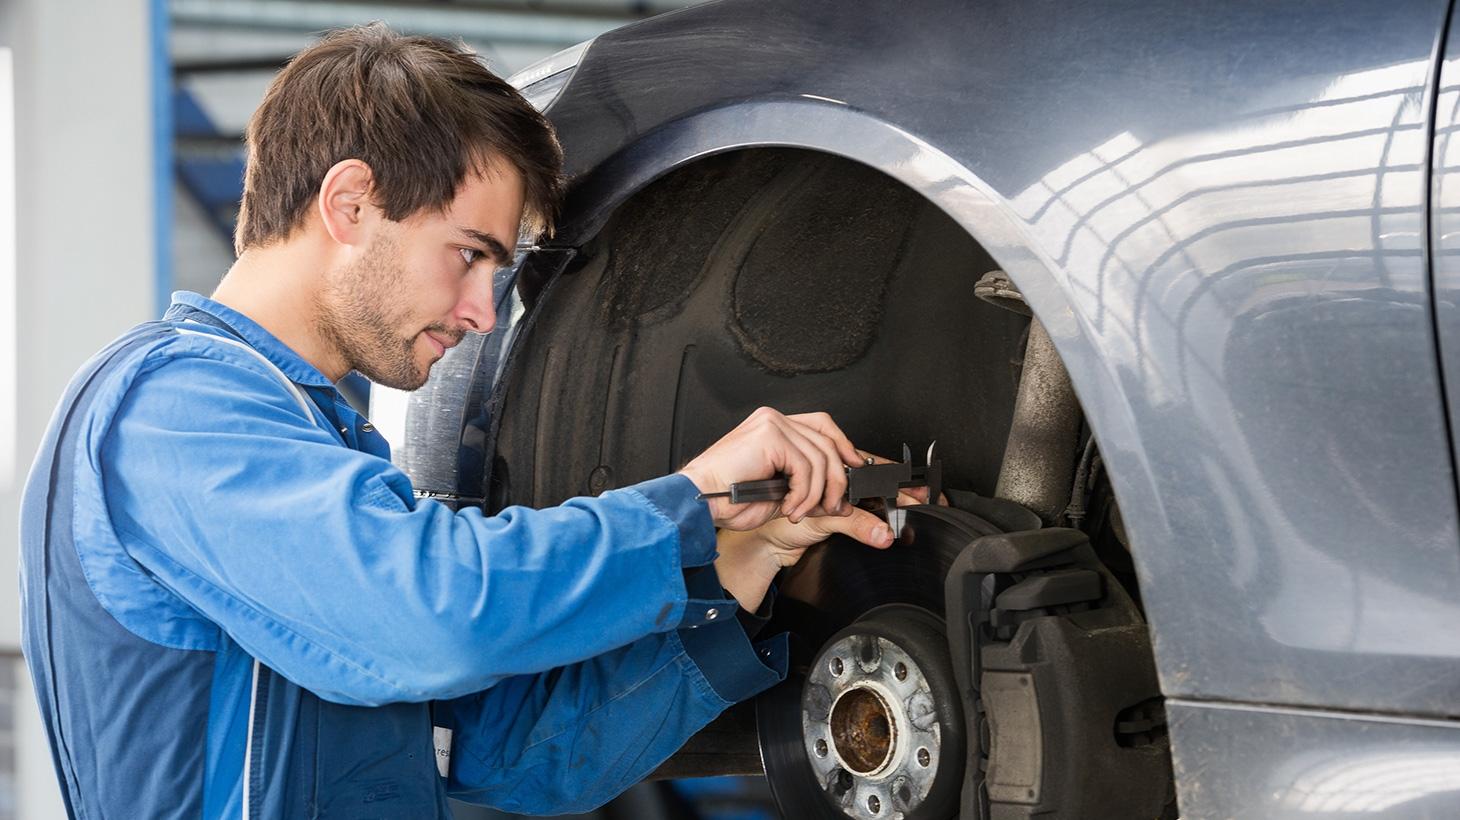 Mechanic checking brakes on car in work shop